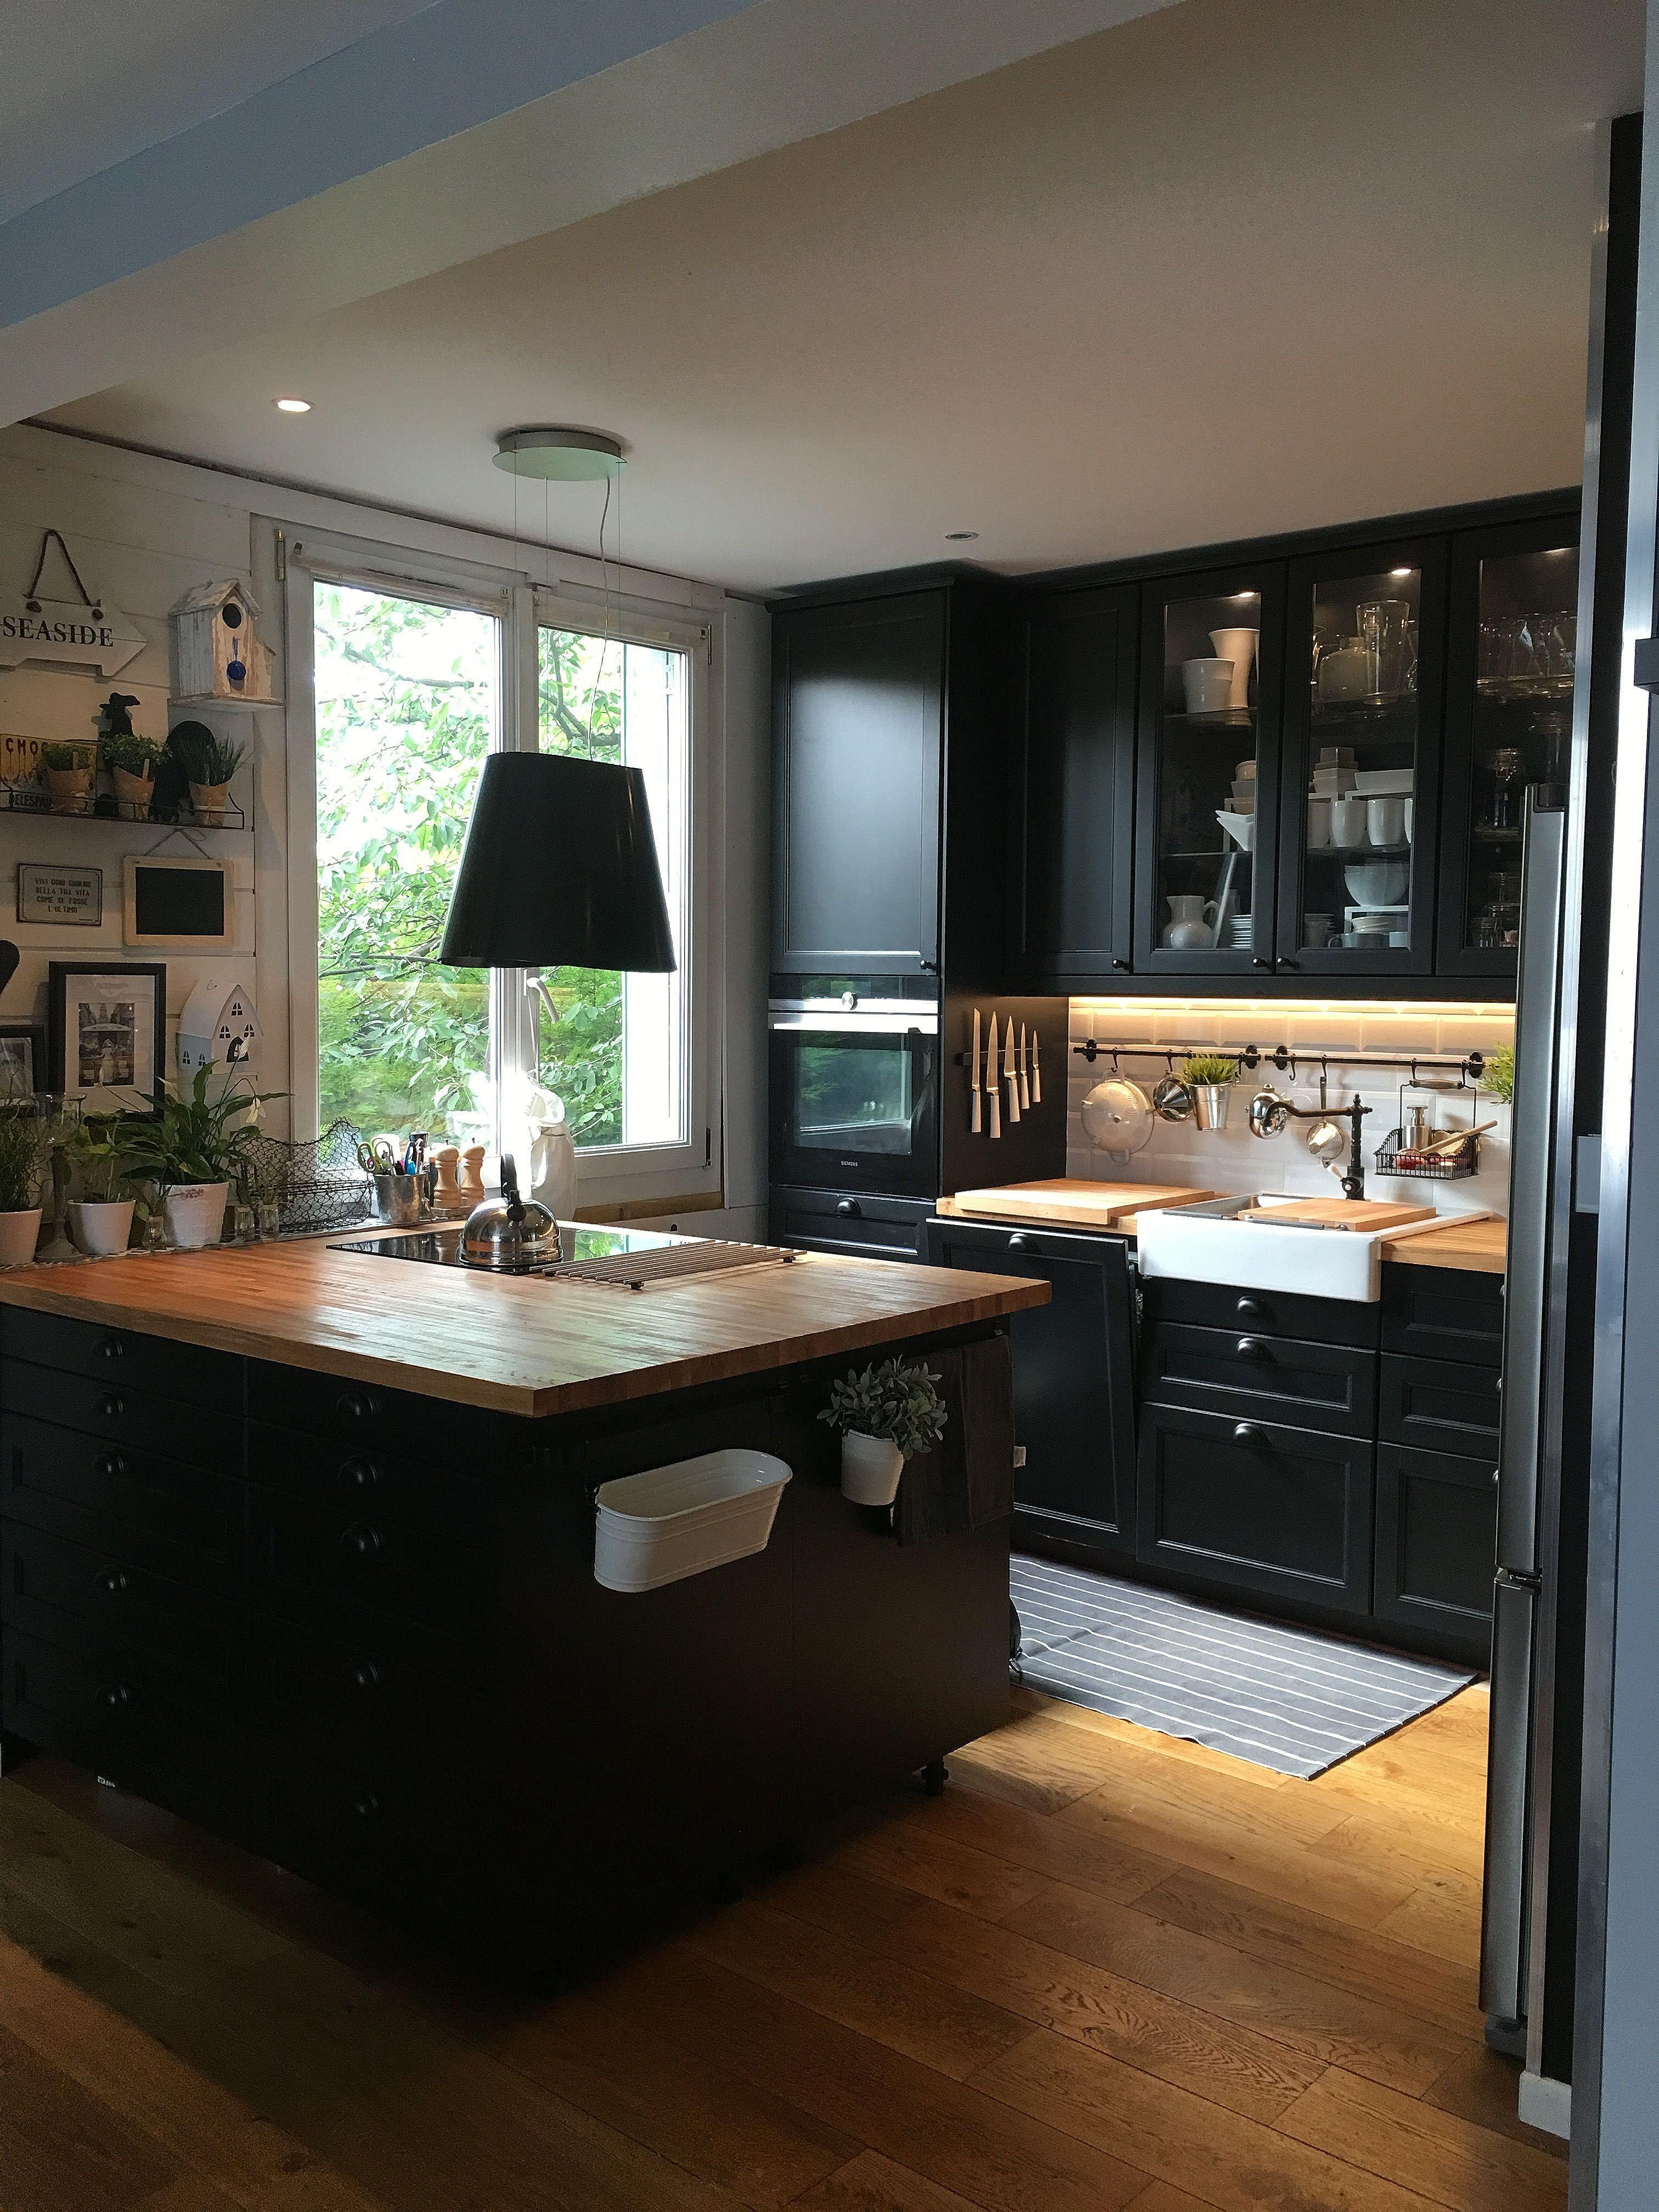 Handyman kitchen cabinets handyman kitchen cabinets ...